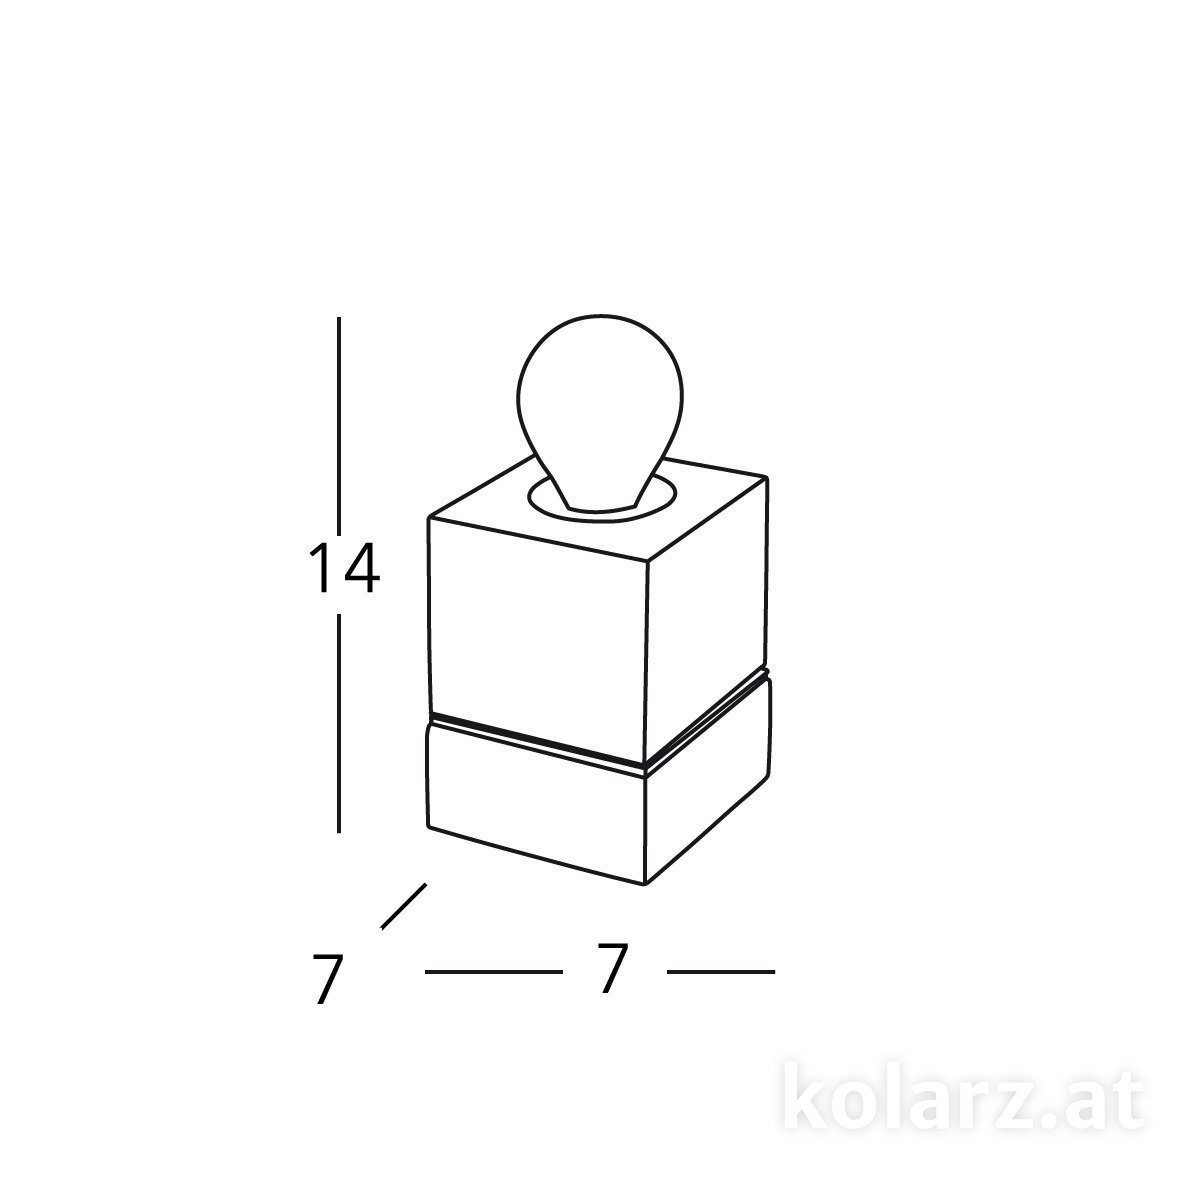 5202-70100-s1.jpg